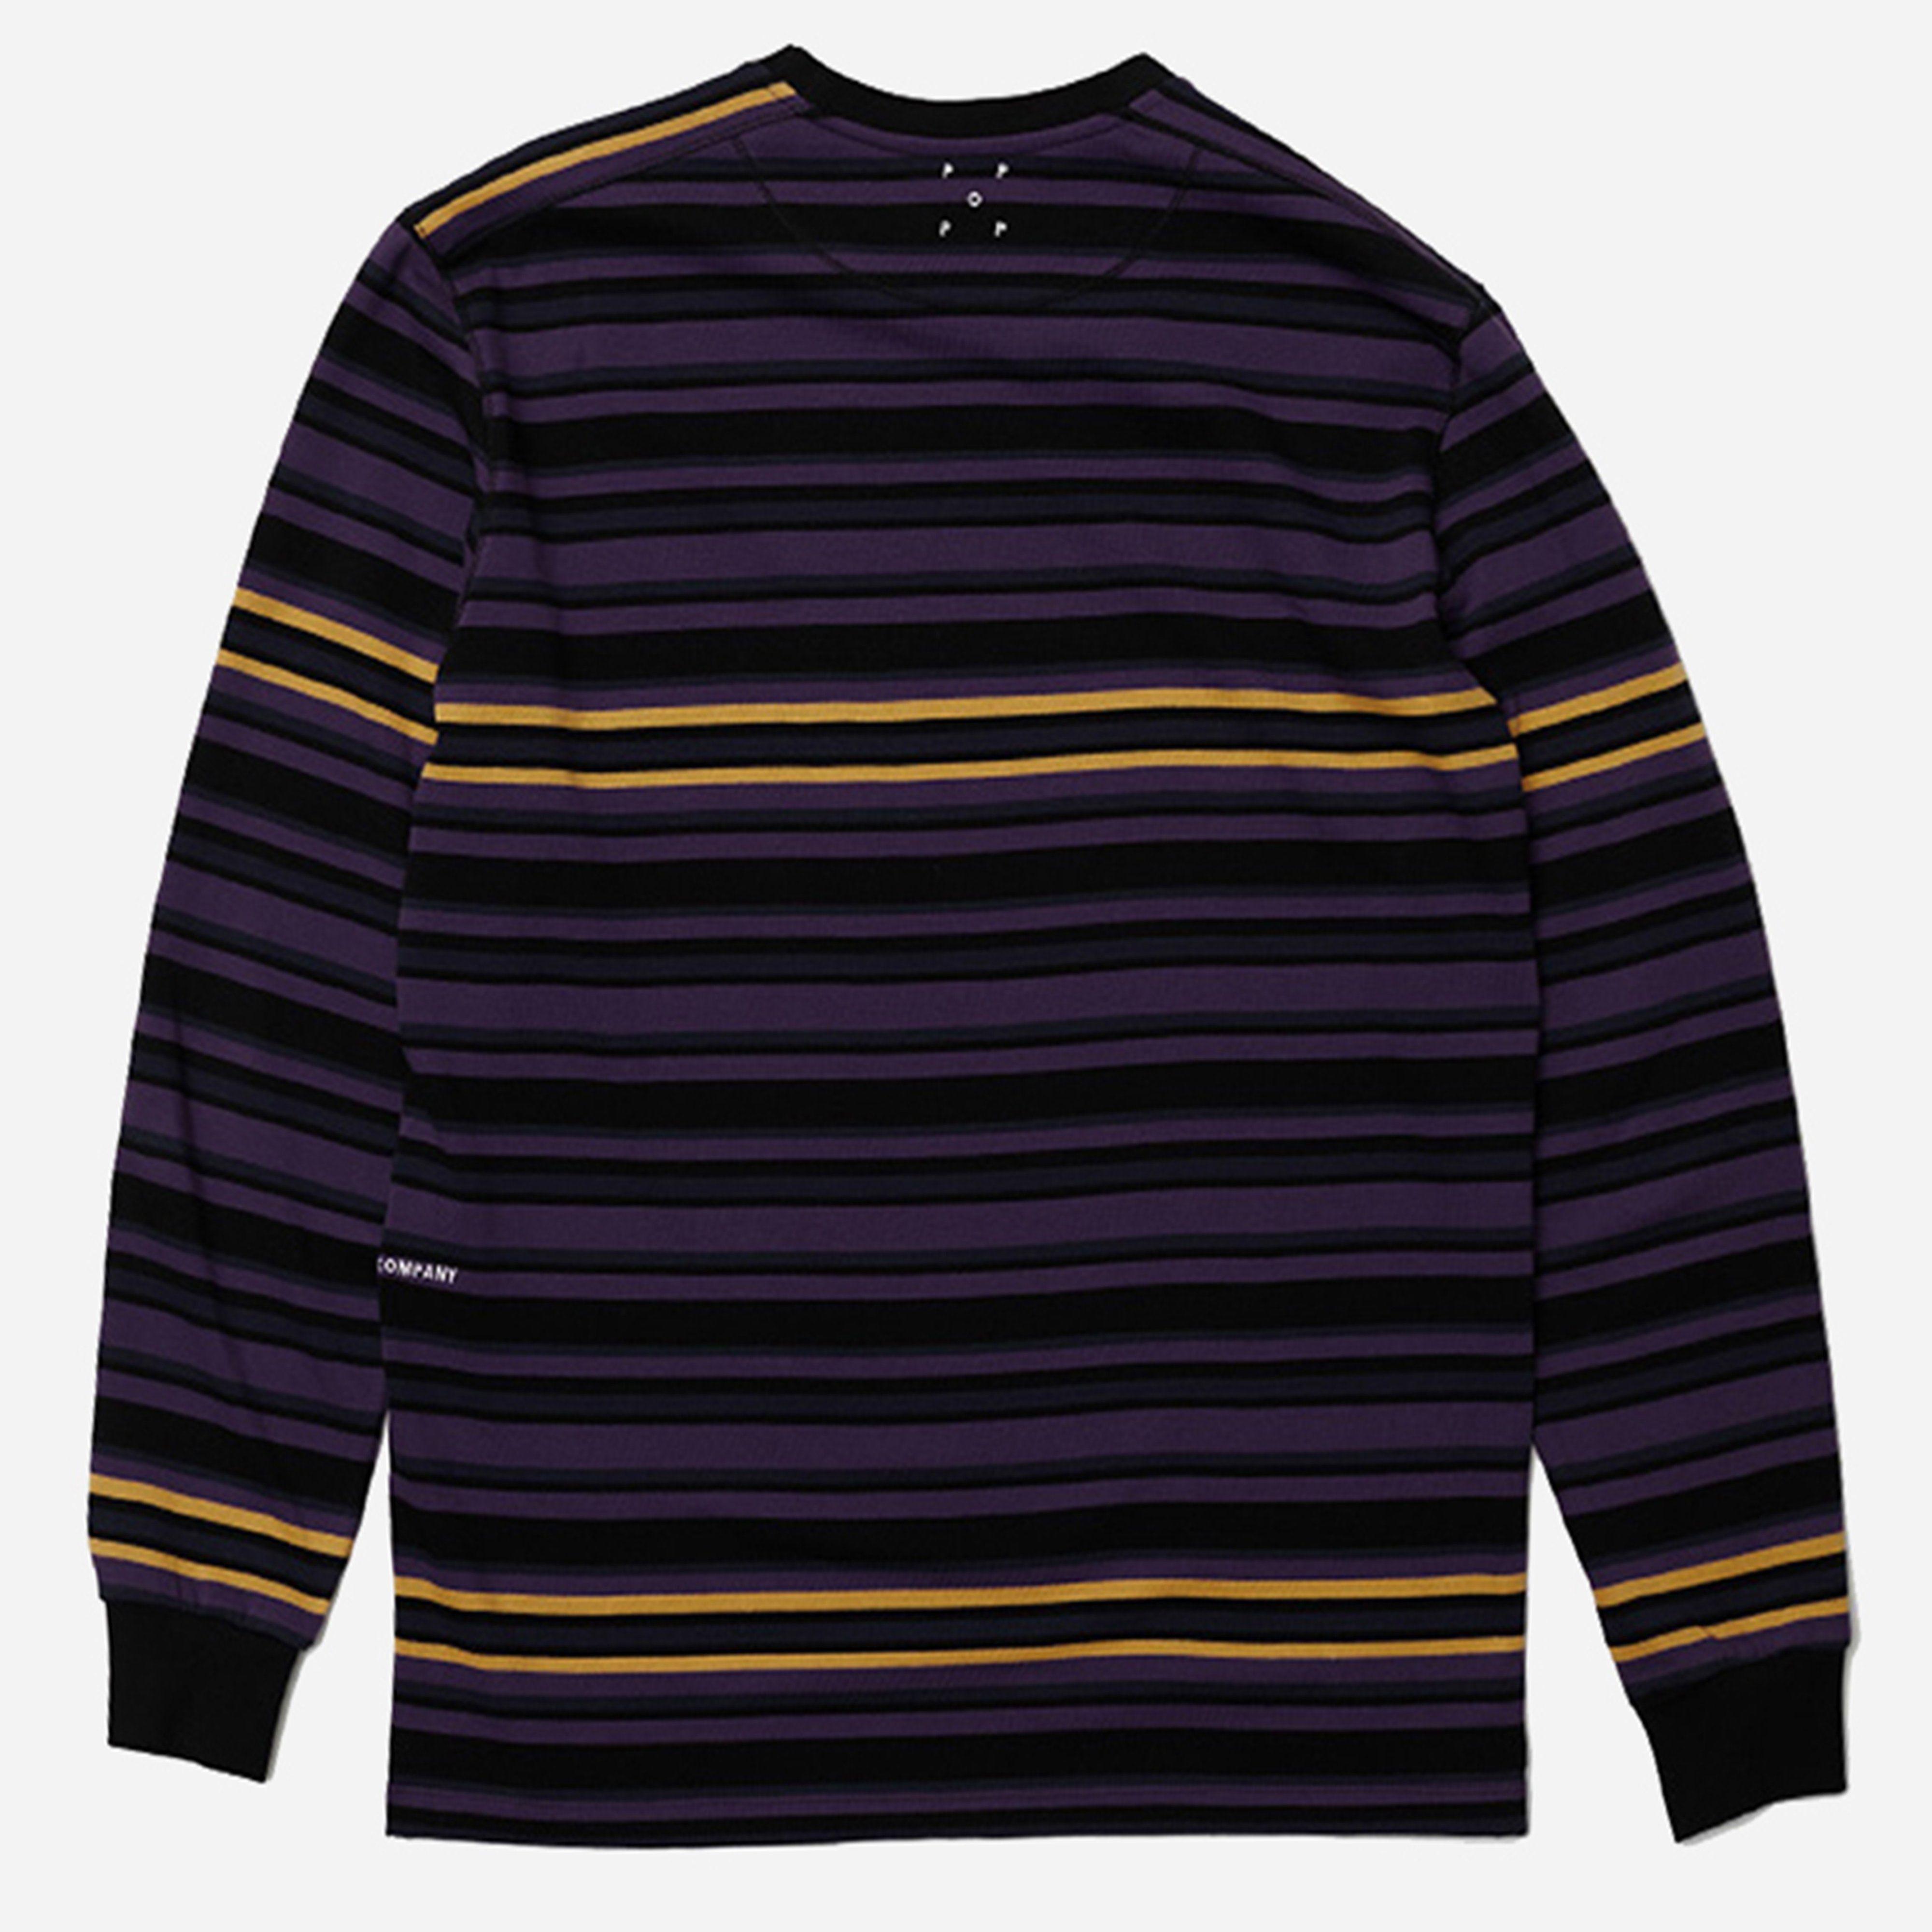 Pop Trading Company Nagel Striped Longsleeve T-Shirt